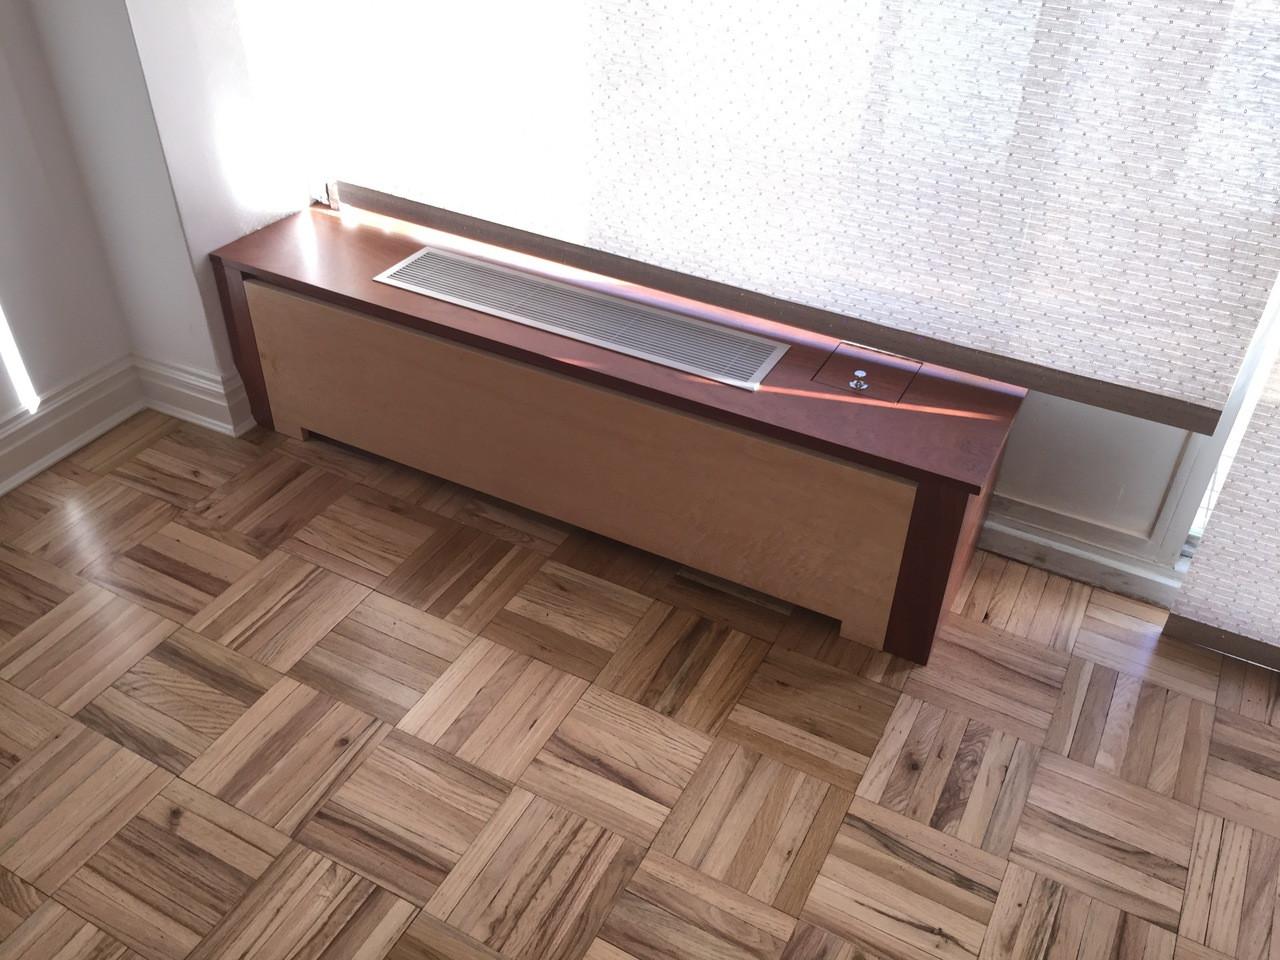 Custom Under Window Two Tone Radiator Cover Gothic Furniture